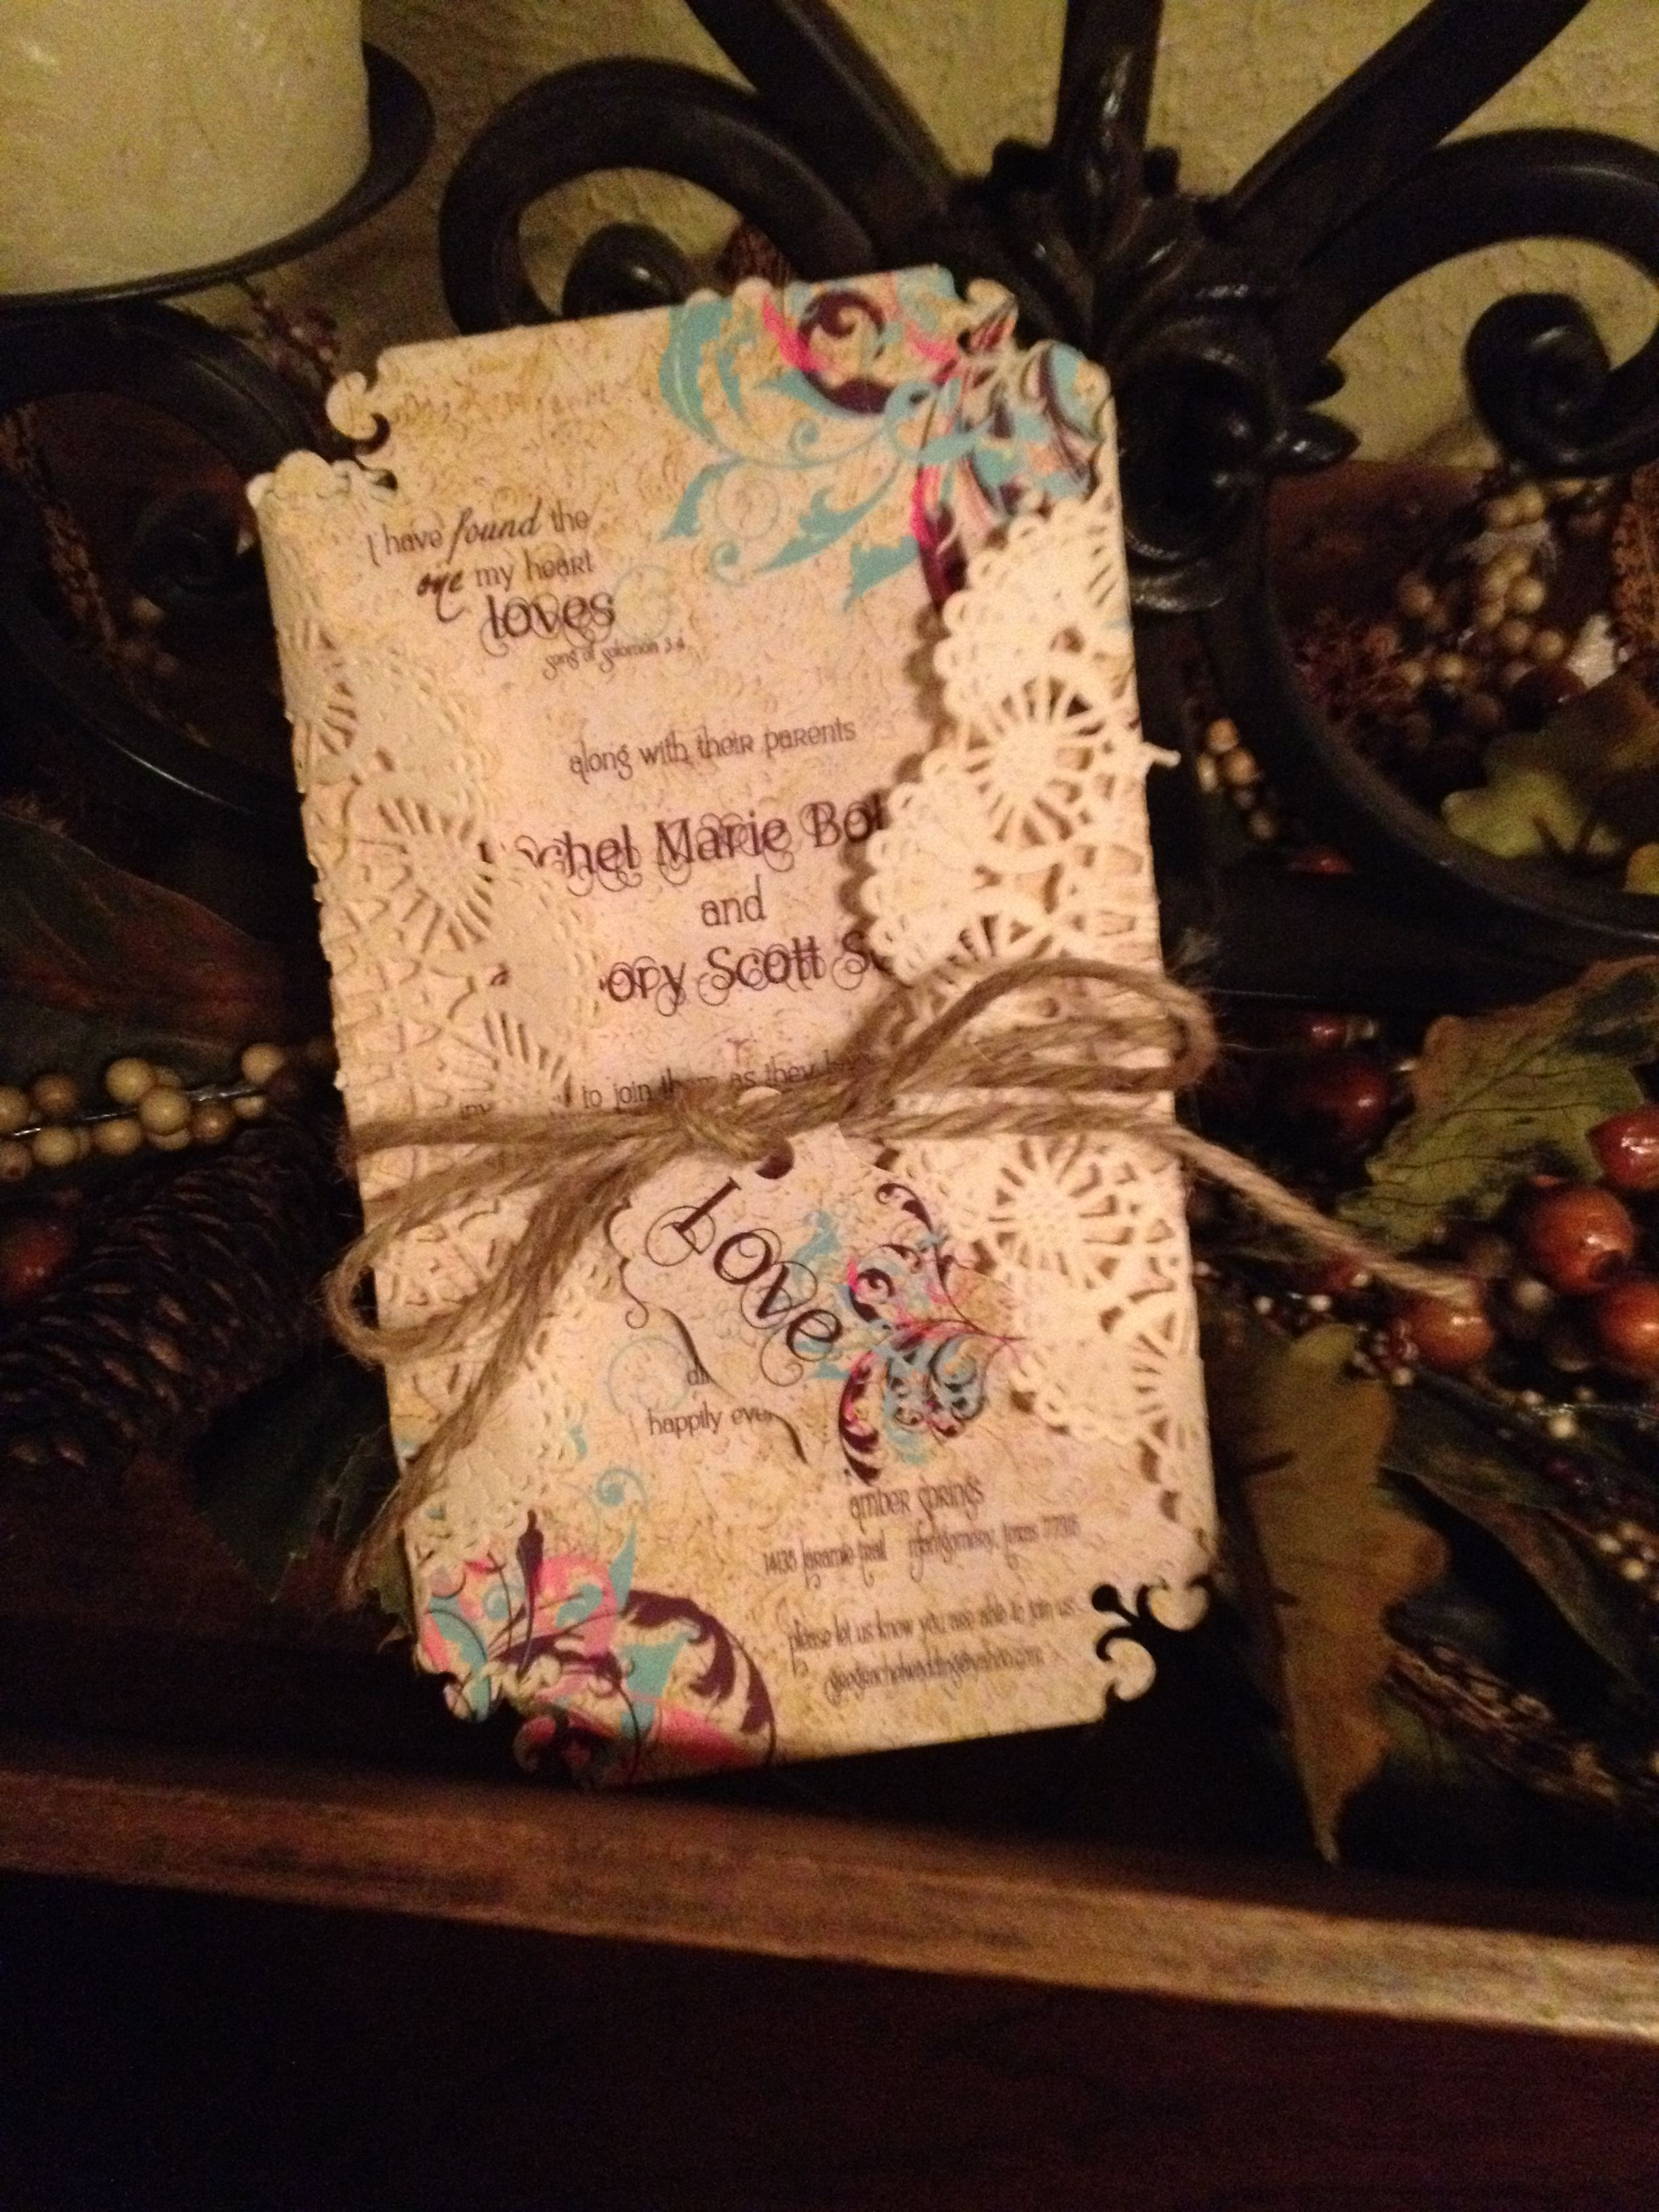 Diy invite i made using tea stained doilies as a jacket precious